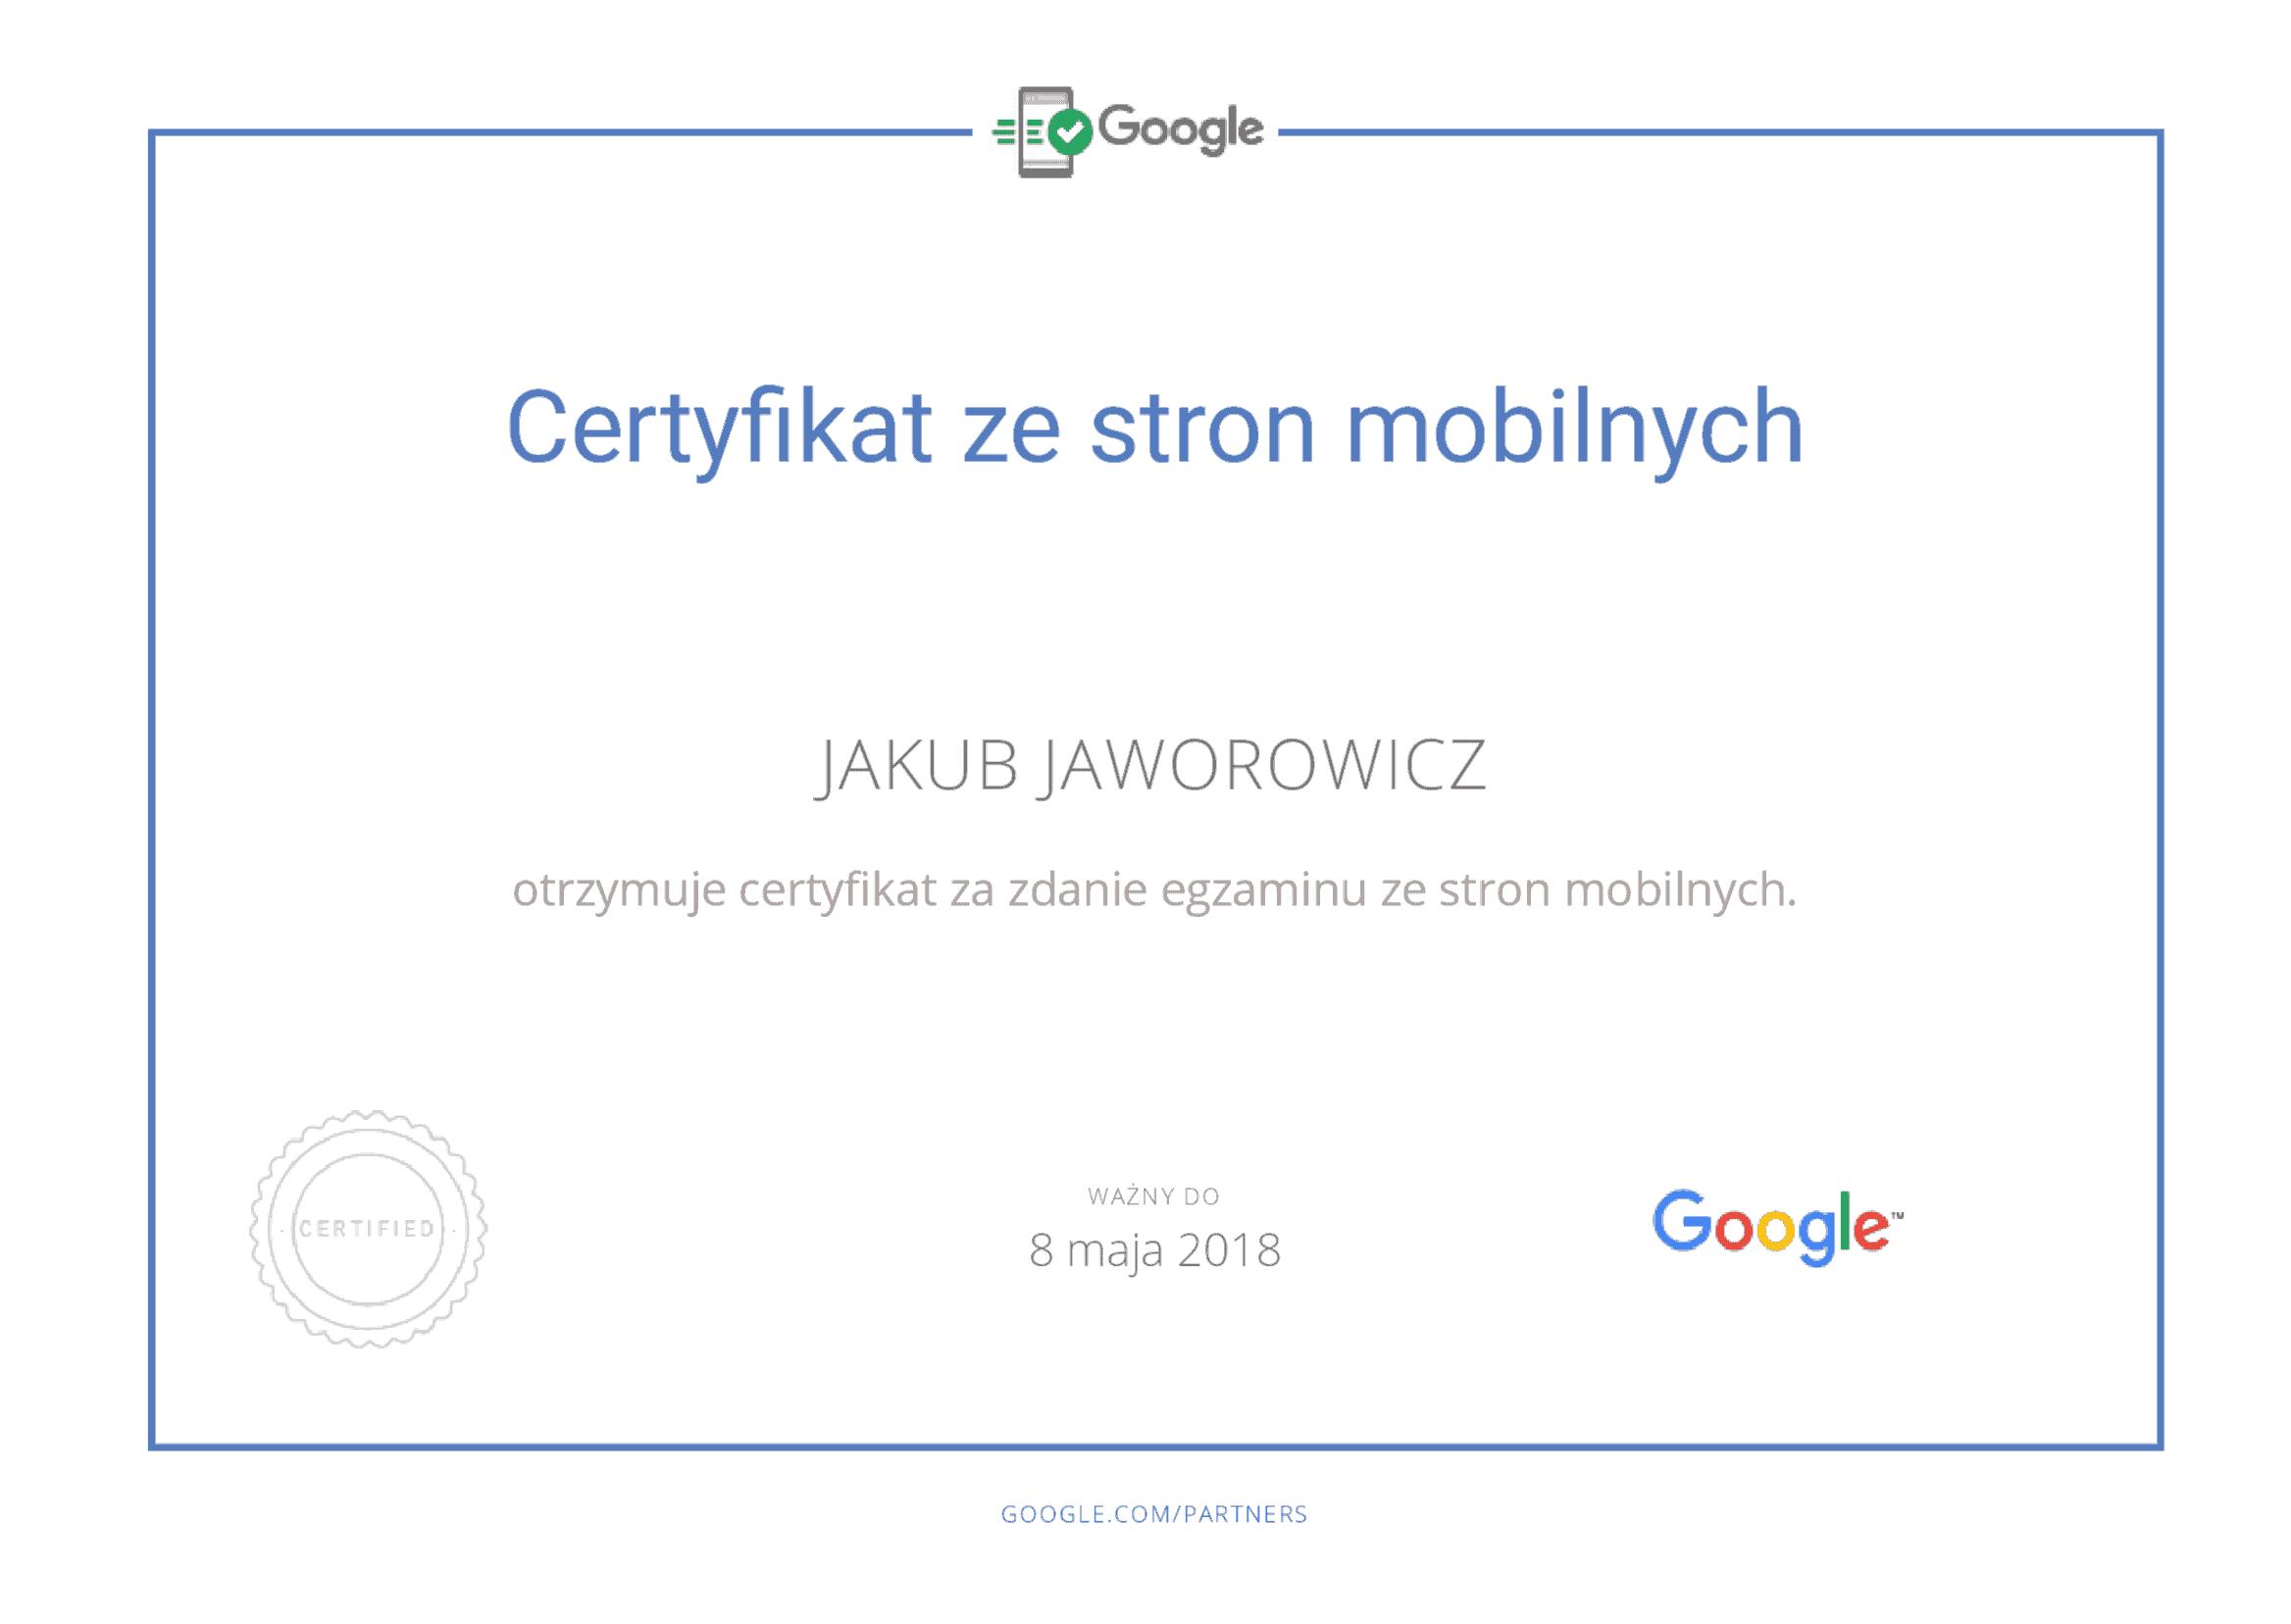 Certyfikat Google zestron Mobilnych